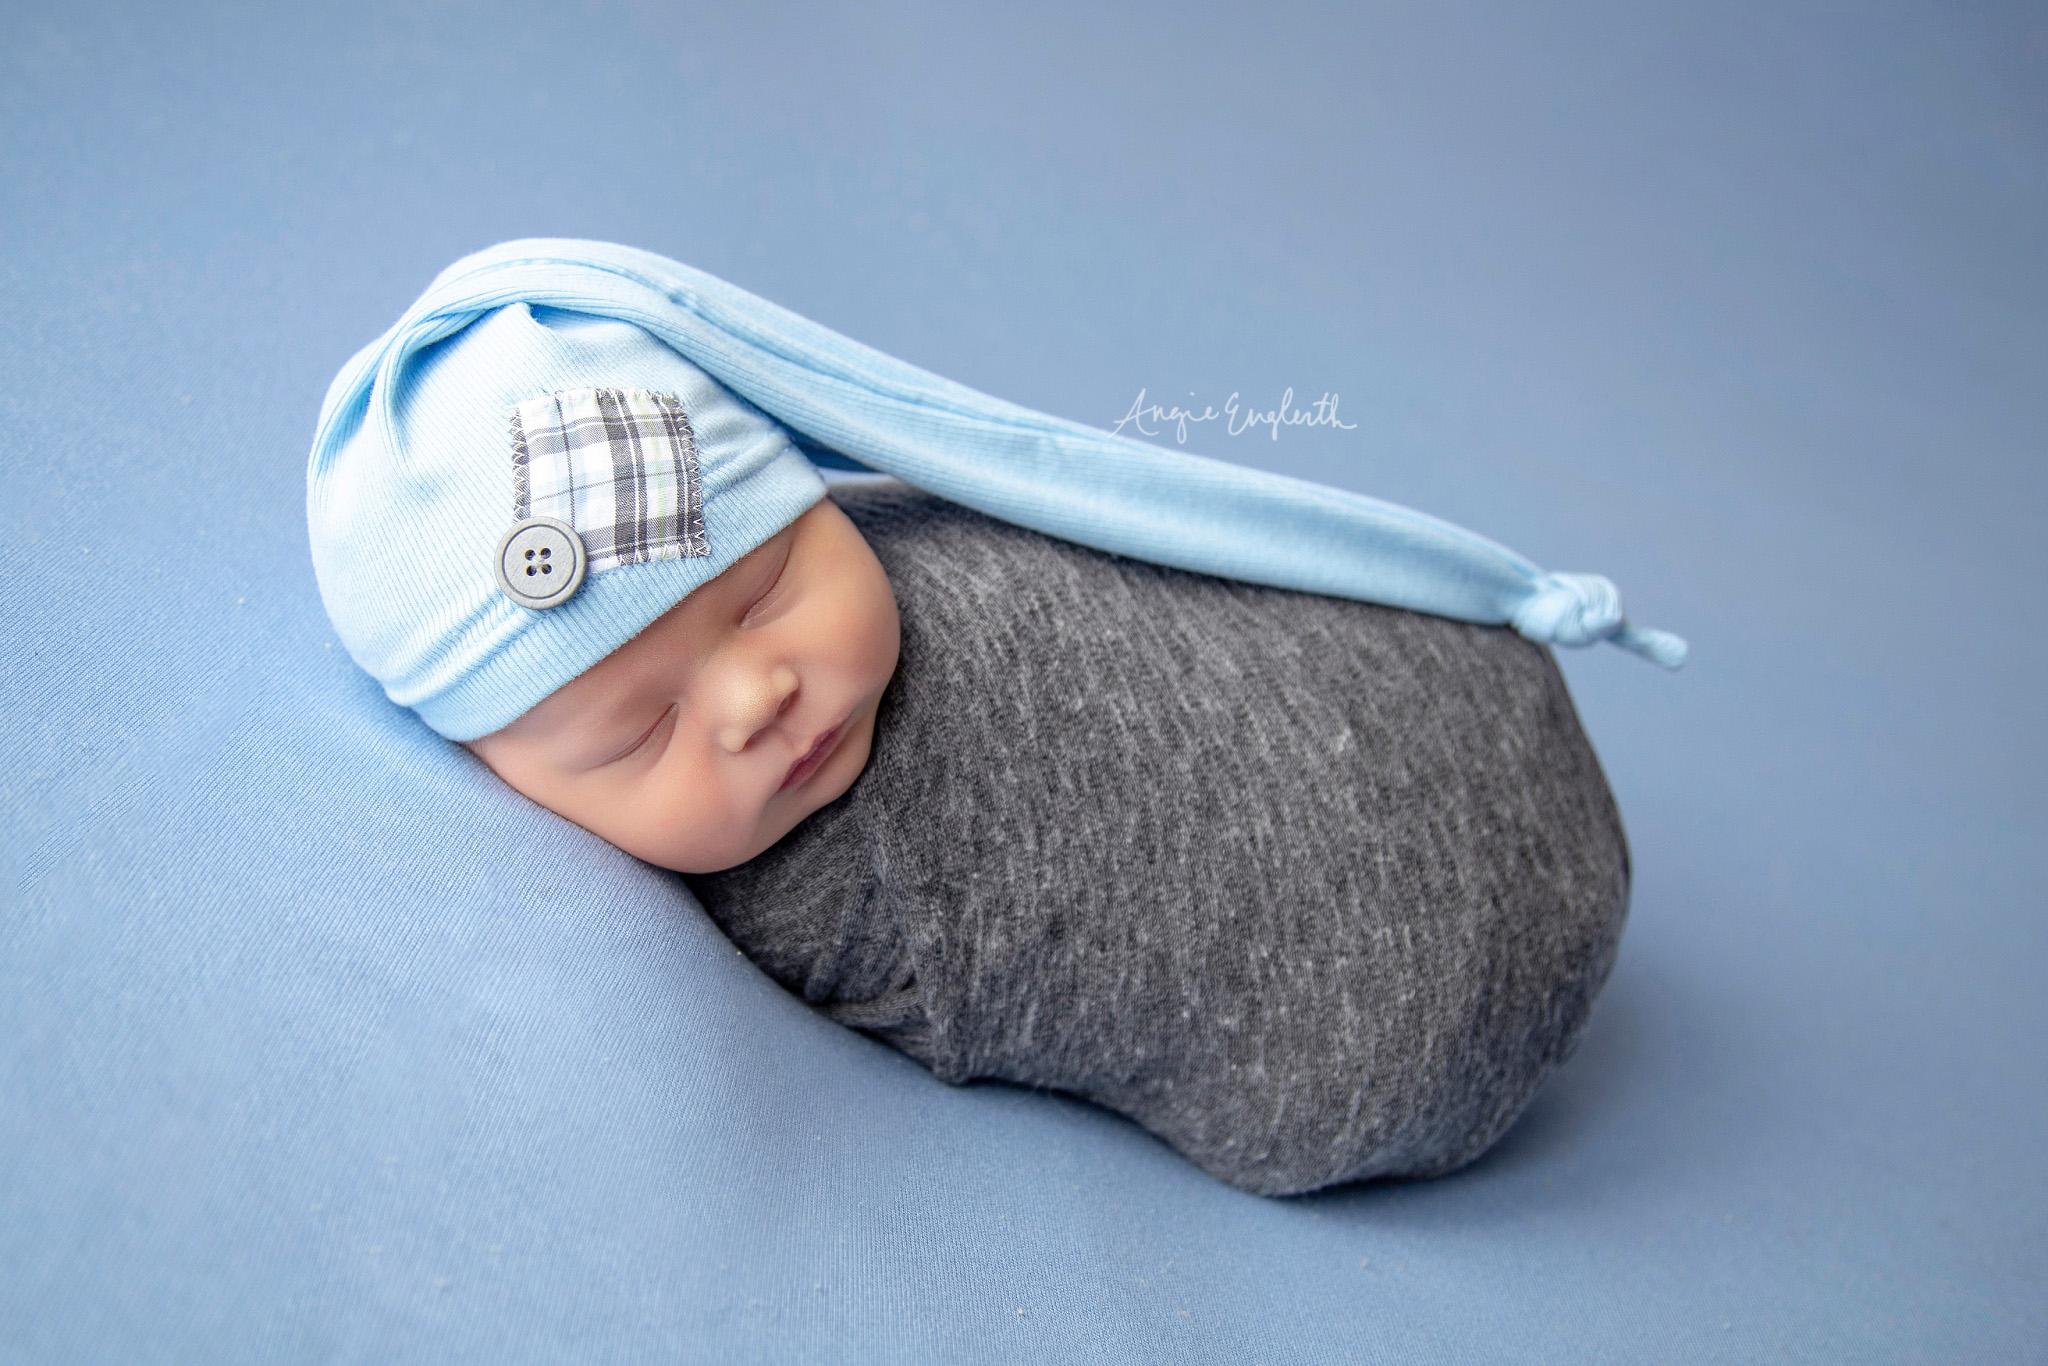 lancaster_newborn_photographer_angie_englerth_central_pa_019.jpg